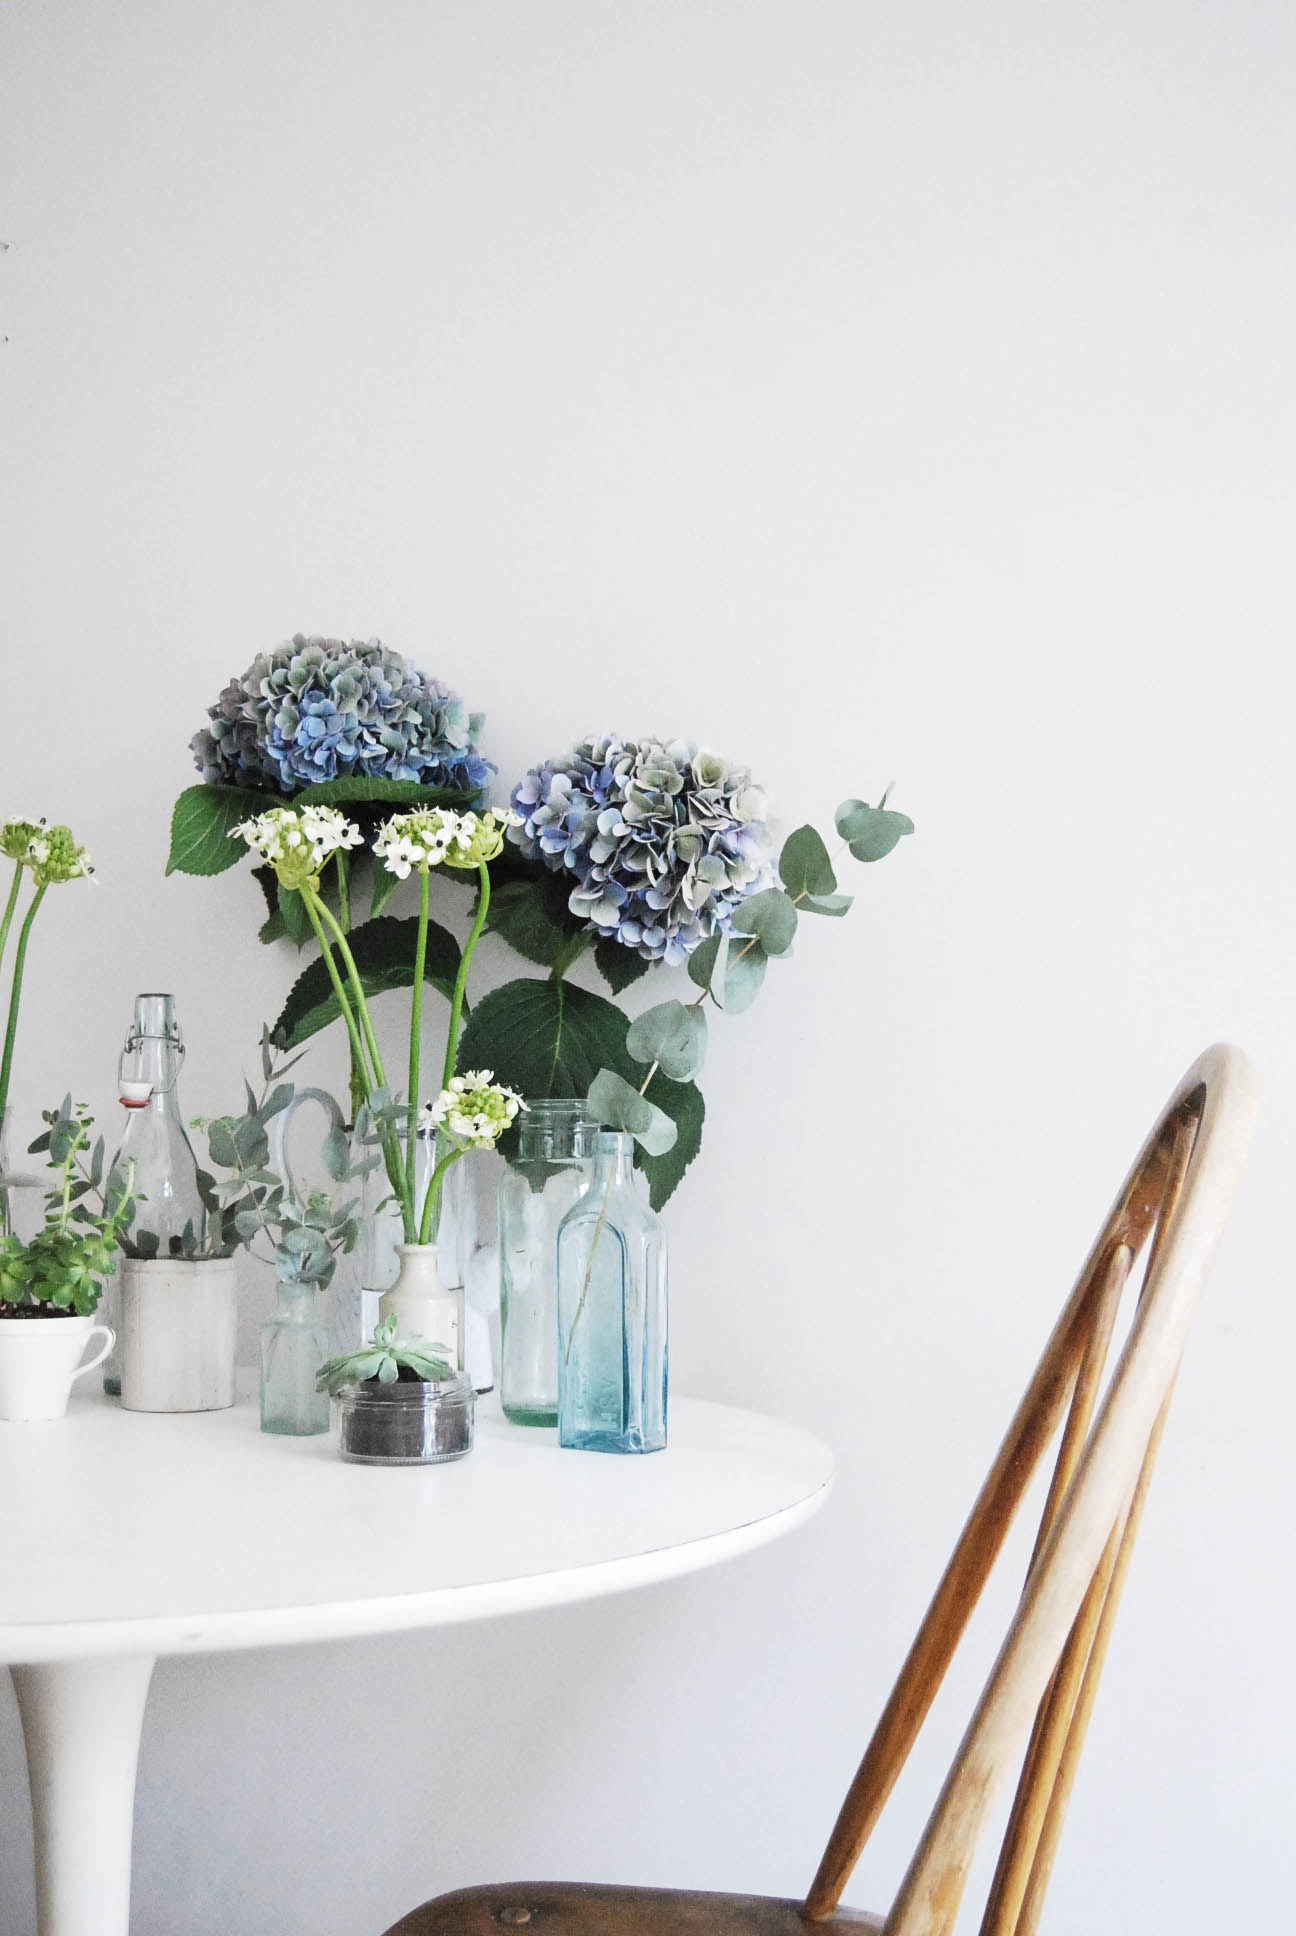 Catesthill blog - Urban Jungle bloggers plants & flowers